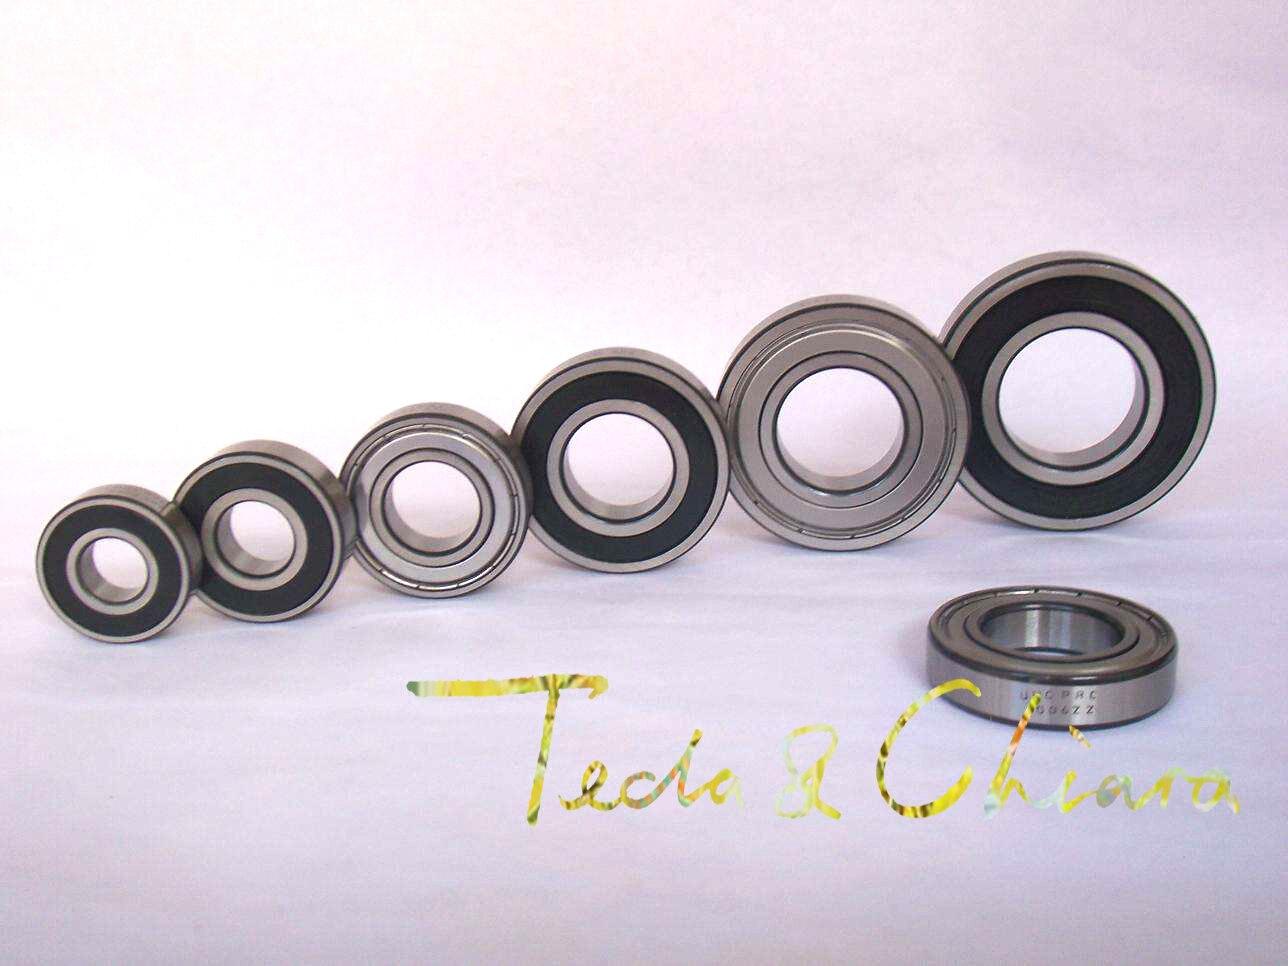 10Pcs 678RS 678ZZ MR128 MR128ZZ MR128RS MR128-2Z MR128-2RS 678 ZZ RS RZ 2RZ Deep Groove Ball Bearings 8 x 12 x 3.5mm free shipping 100pcs mr128zz l 1280 678zz deep groove ball bearing 8x12x3 5mm miniature bearing mr128 zz mr128z